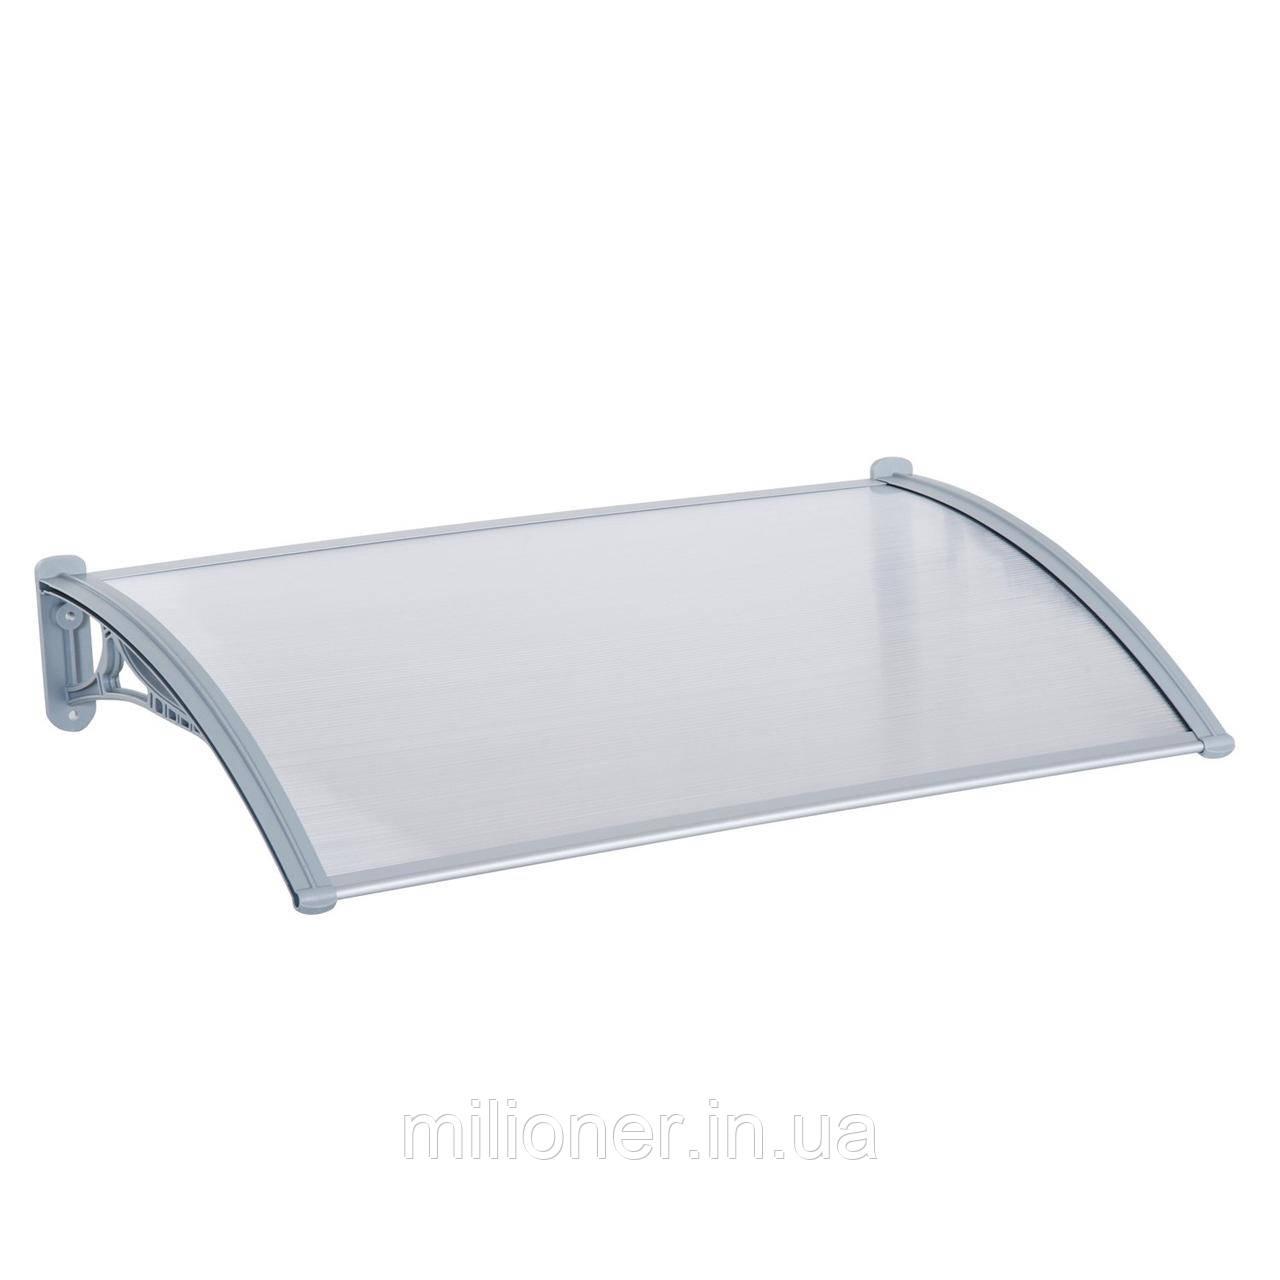 Навес для входных дверей Siker 700-N (700*1500) Grey